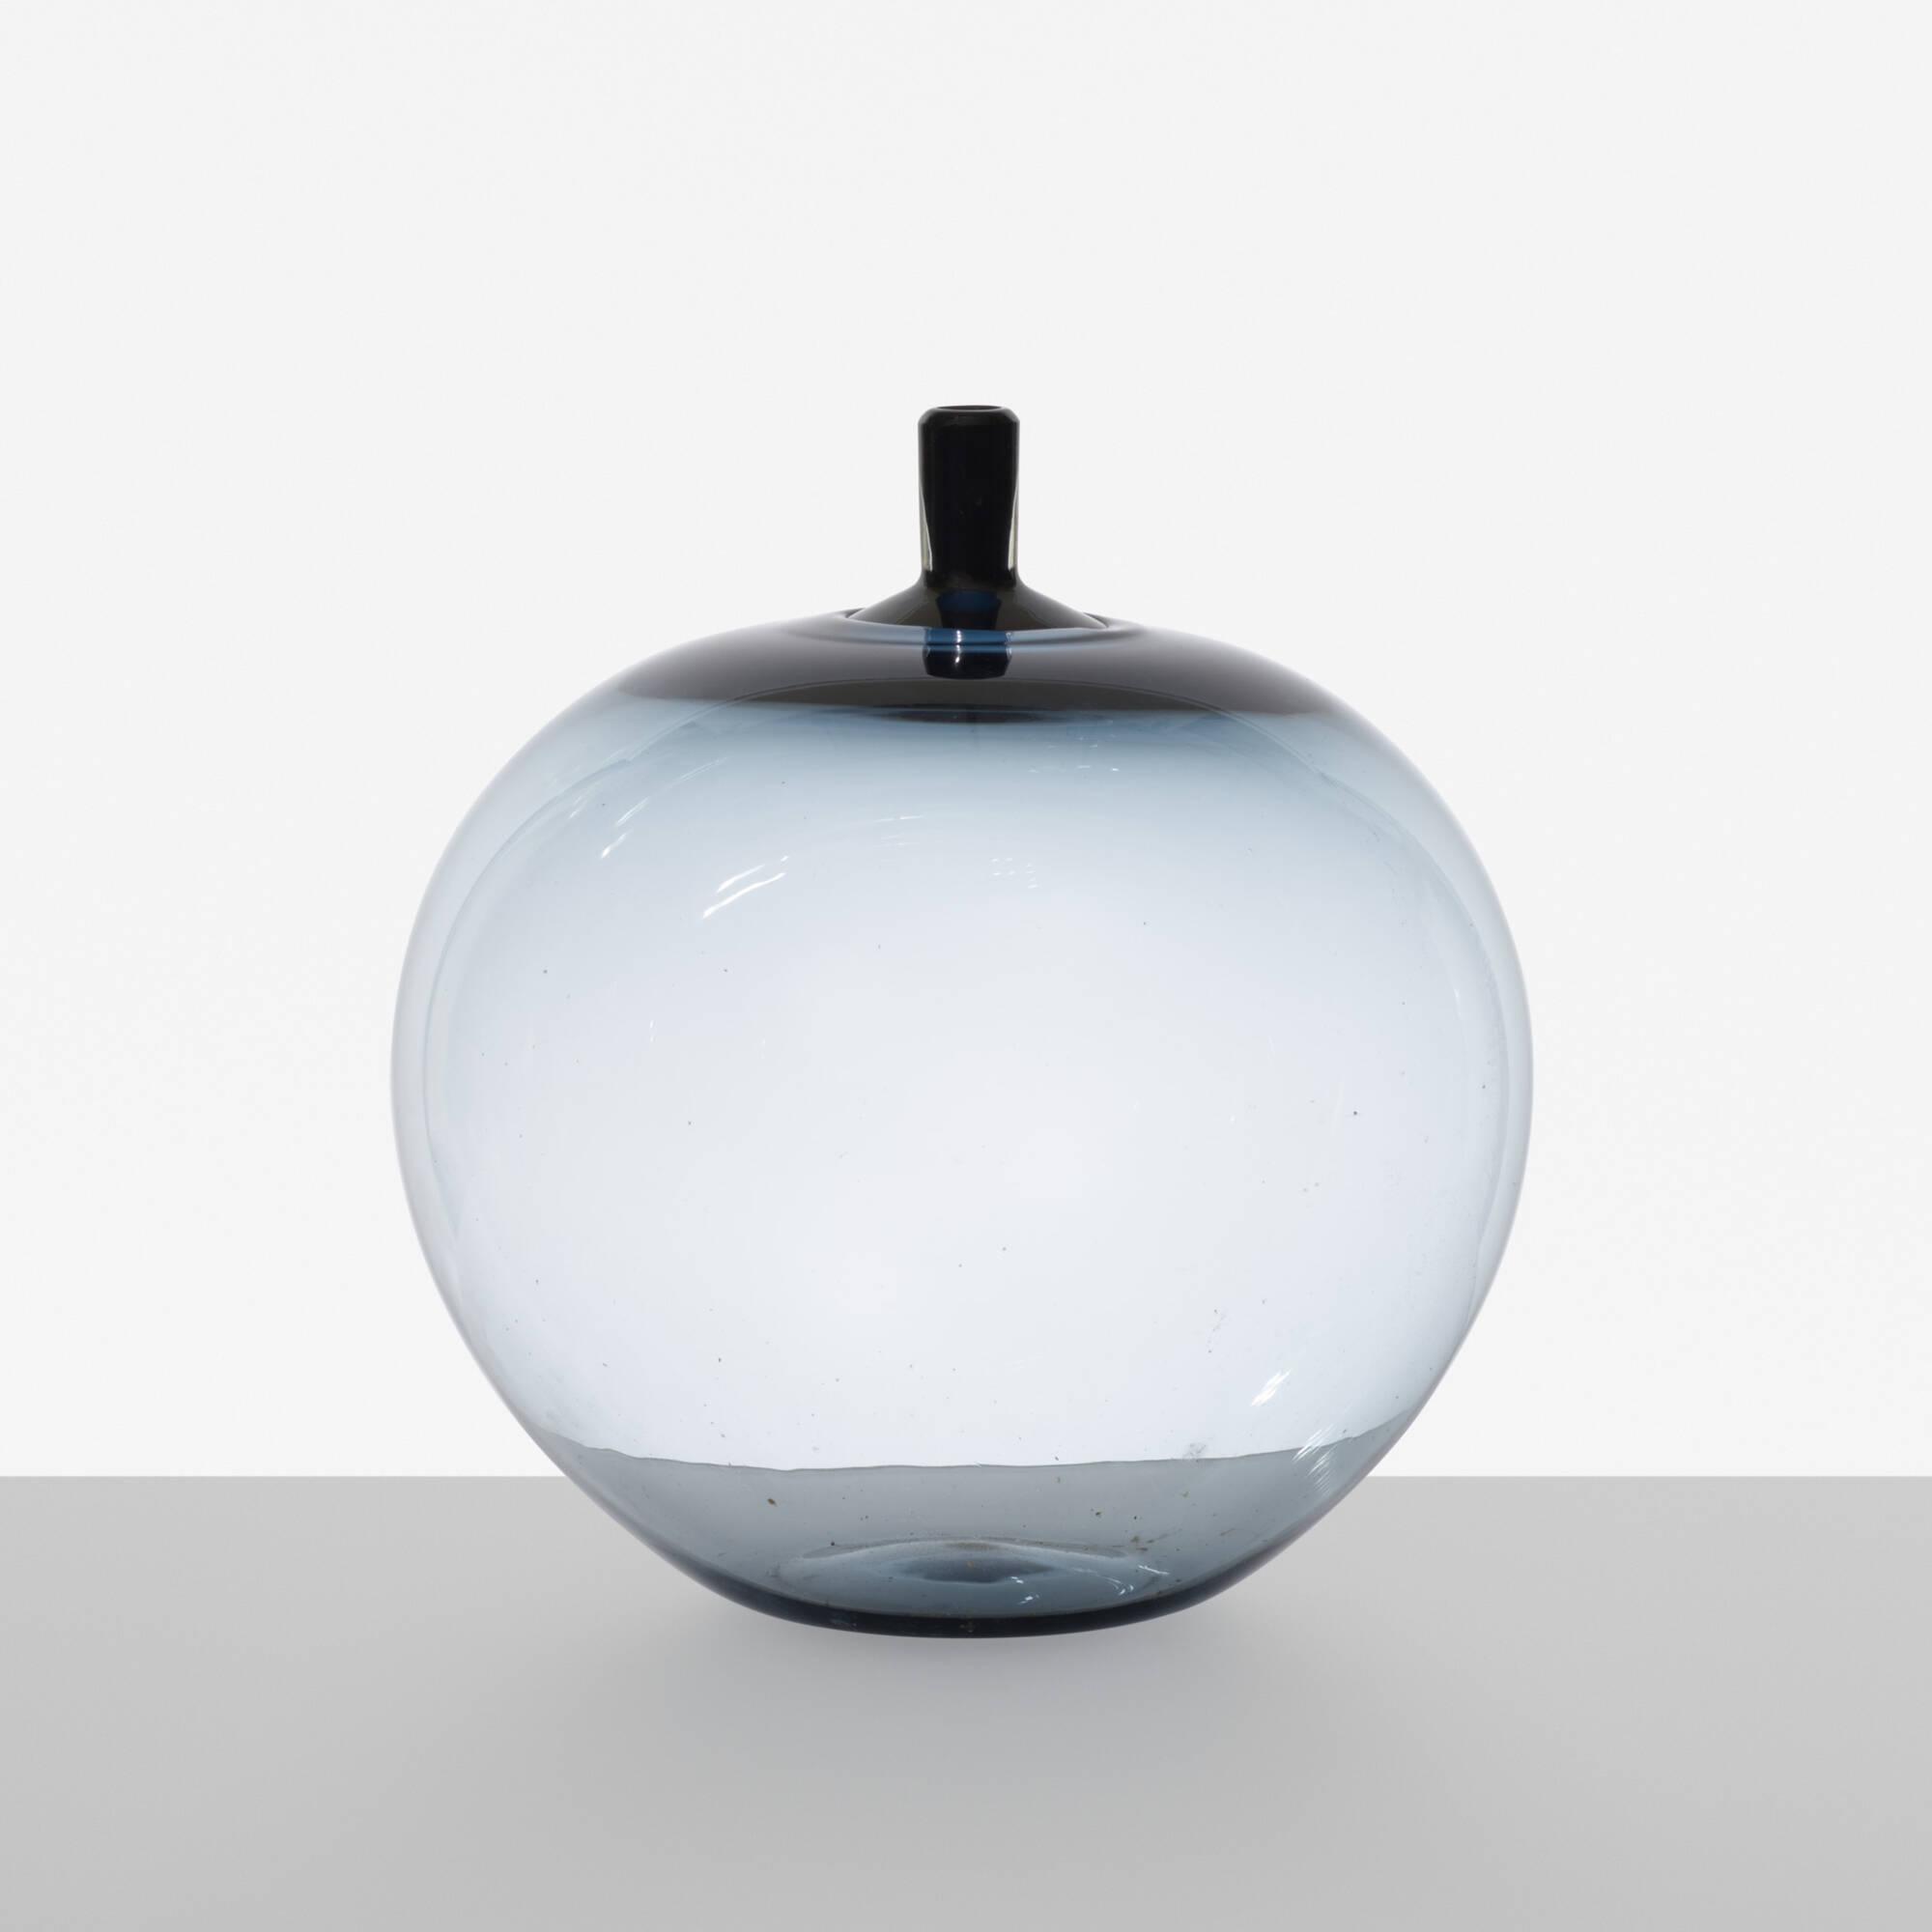 109: Ingeborg Lundin / Apple vase (1 of 2)